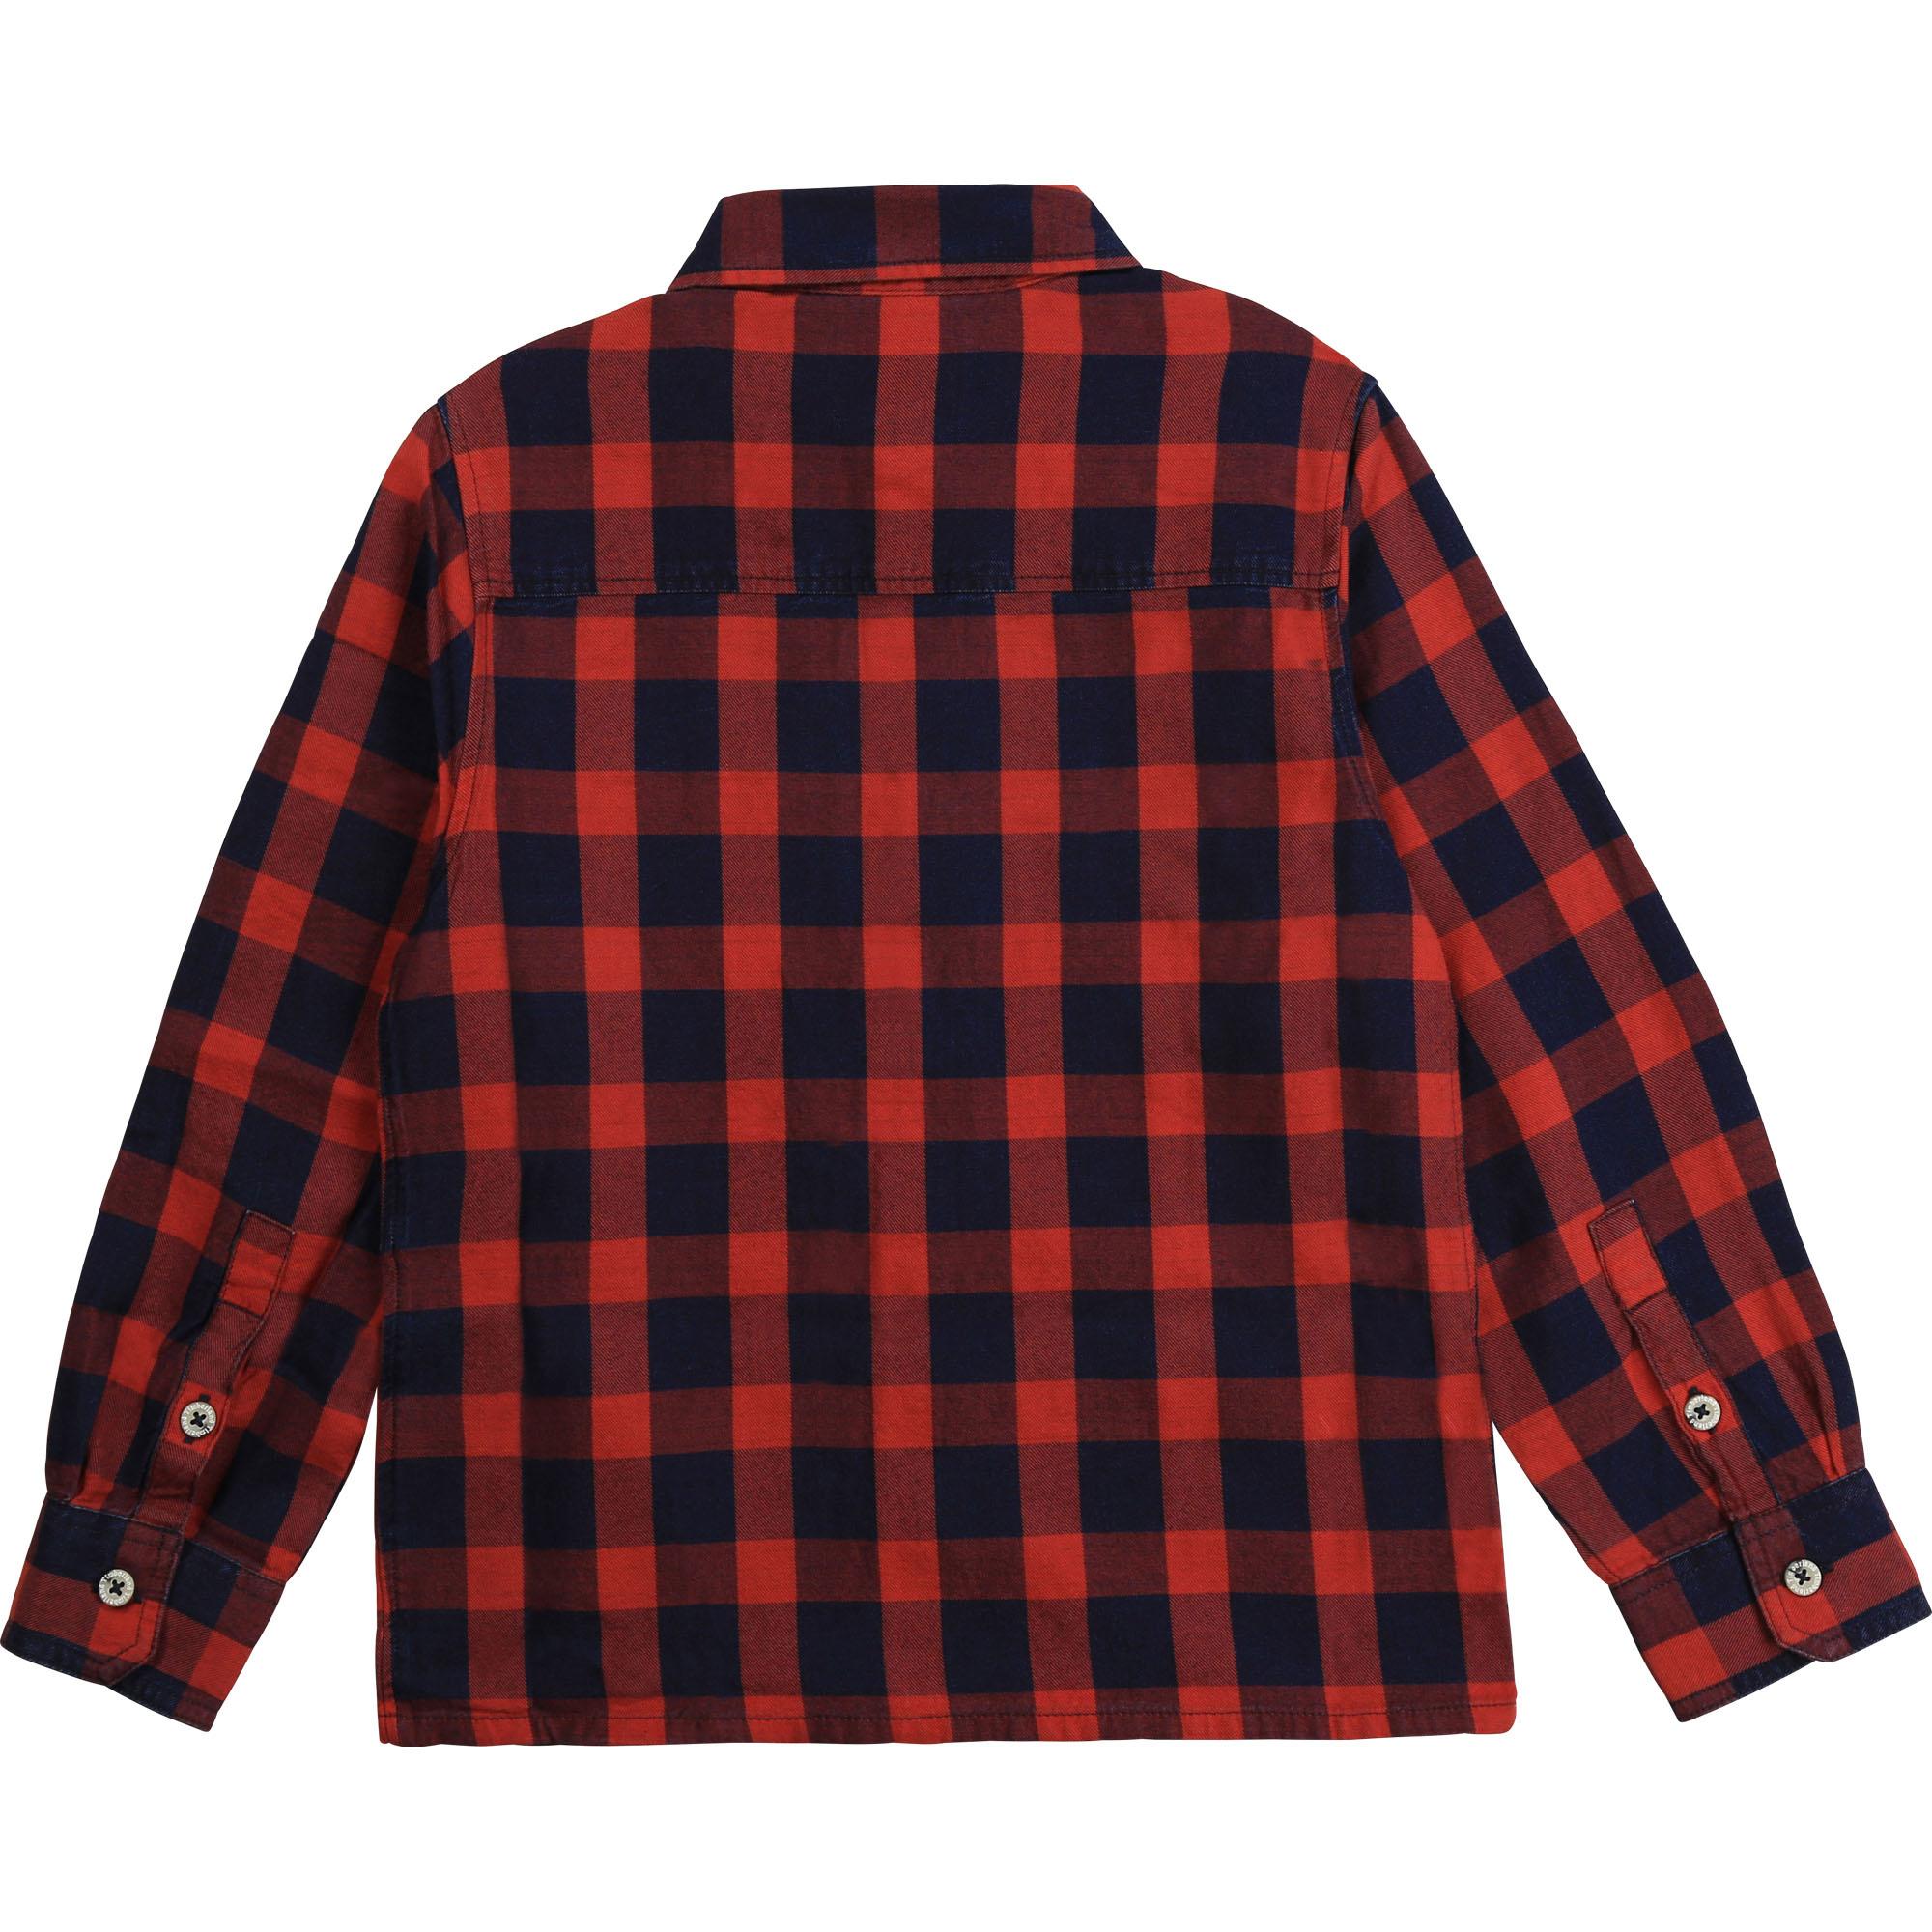 TIMBERLAND chemise rouge vif-2